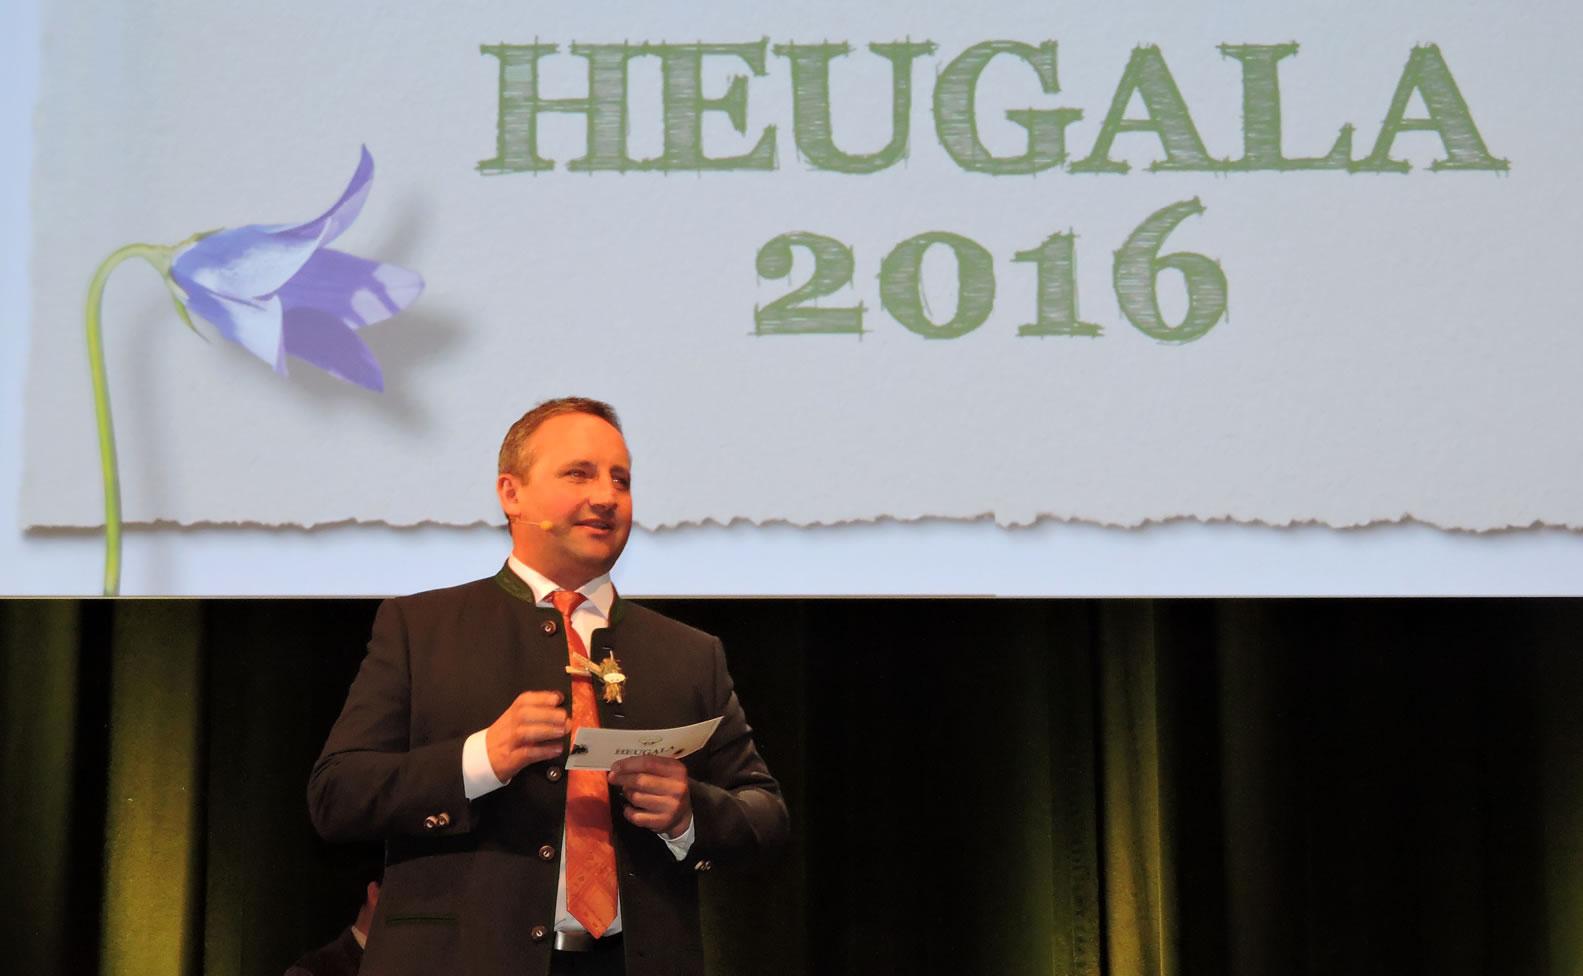 Heumilchgala 2016, Bio-Heu-Region (69)